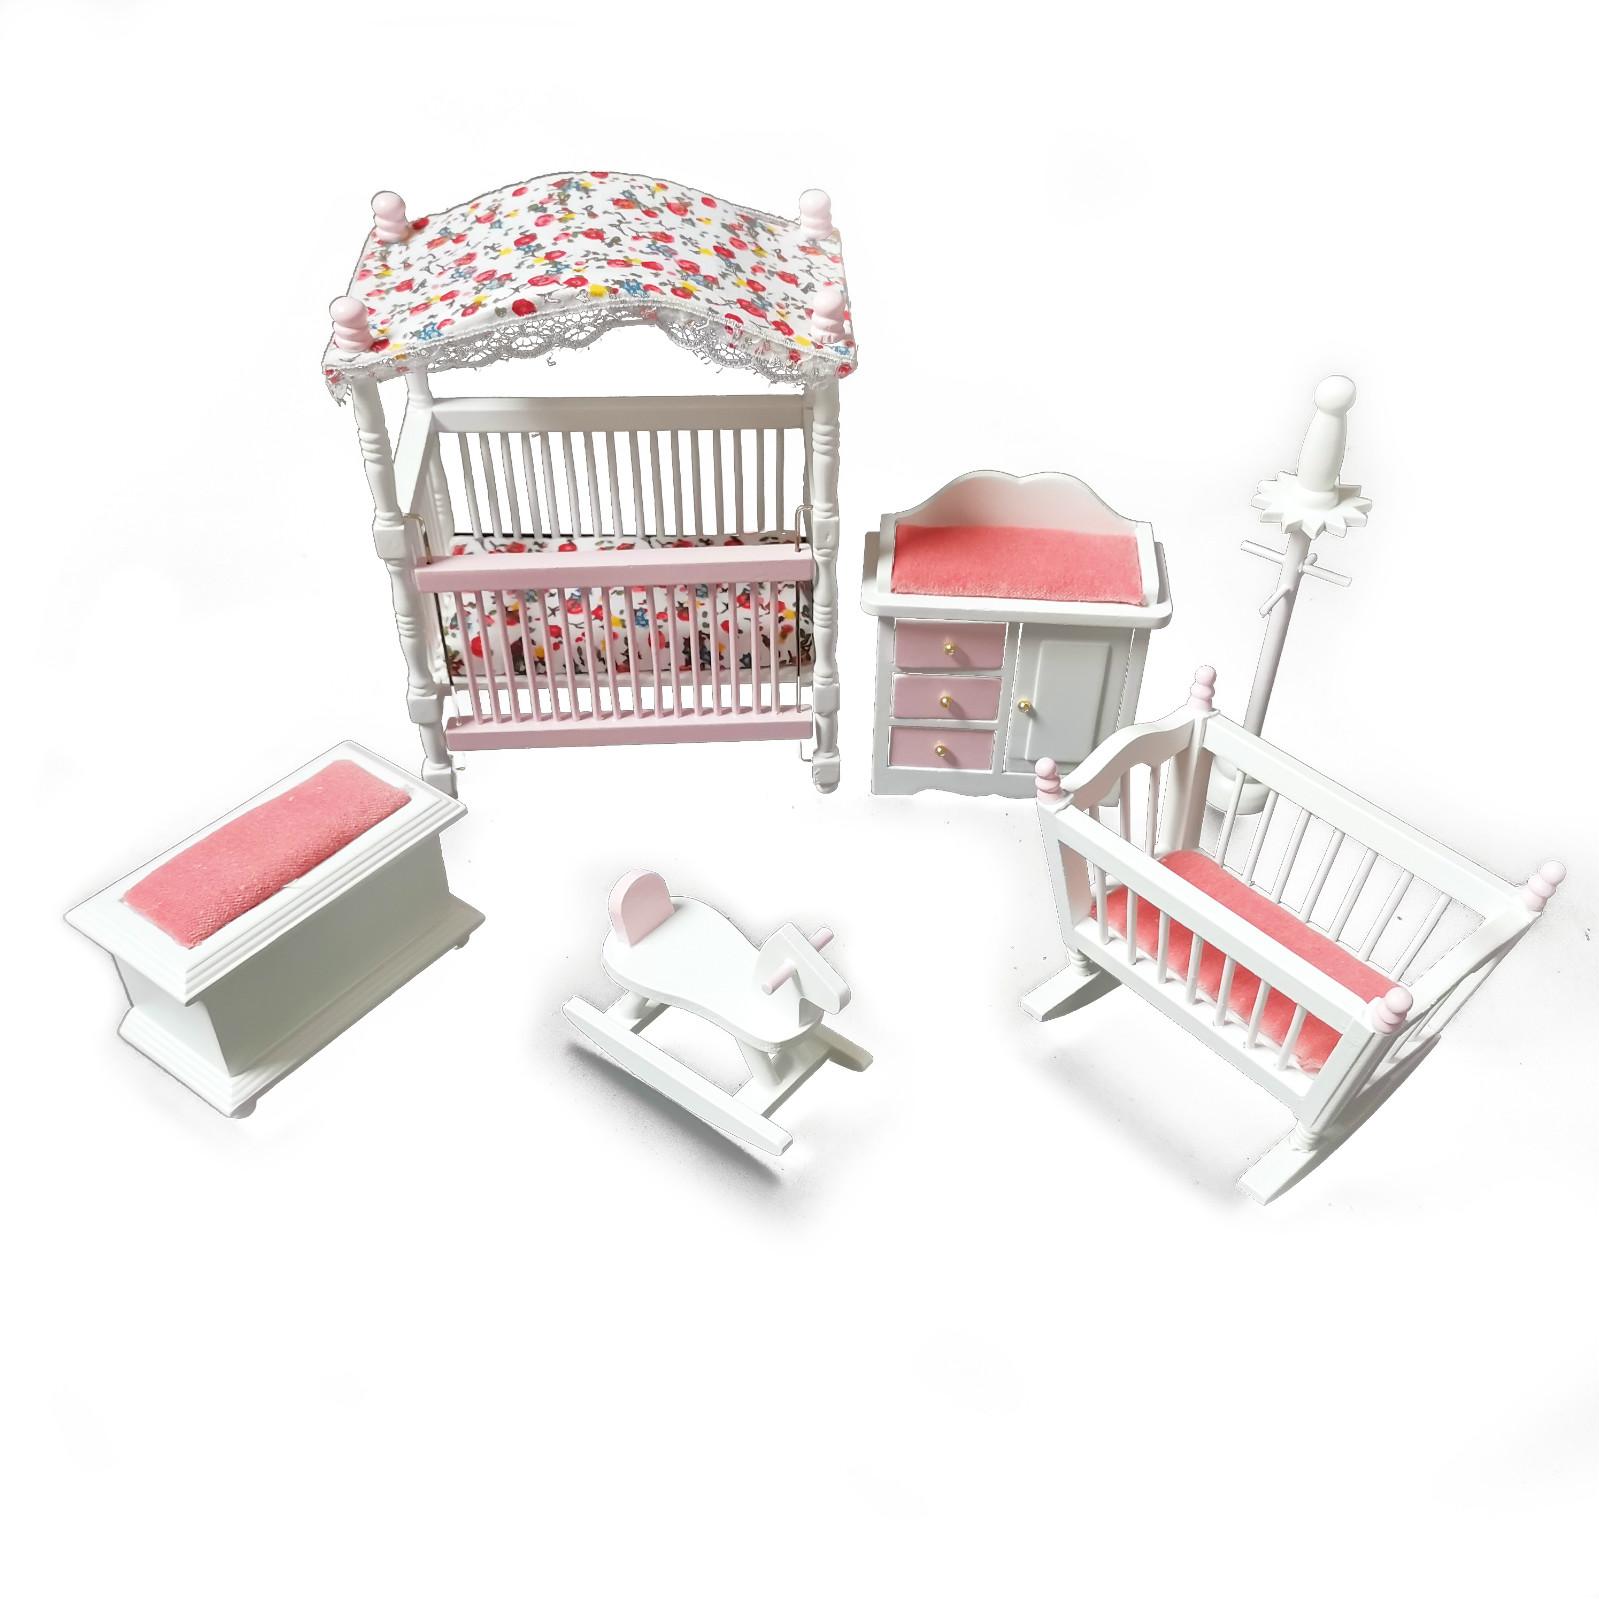 Dollhouse 6Pcs Kids Baby Room Furniture Set 1:12 Miniature Accessories